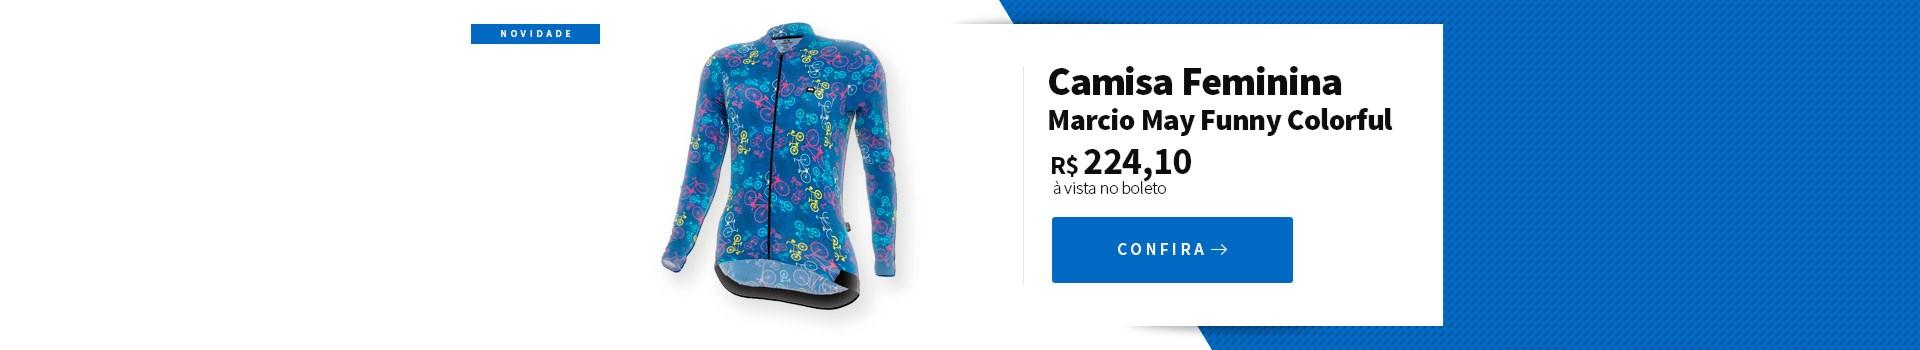 Camisa Feminina Marcio May Funny Colorful